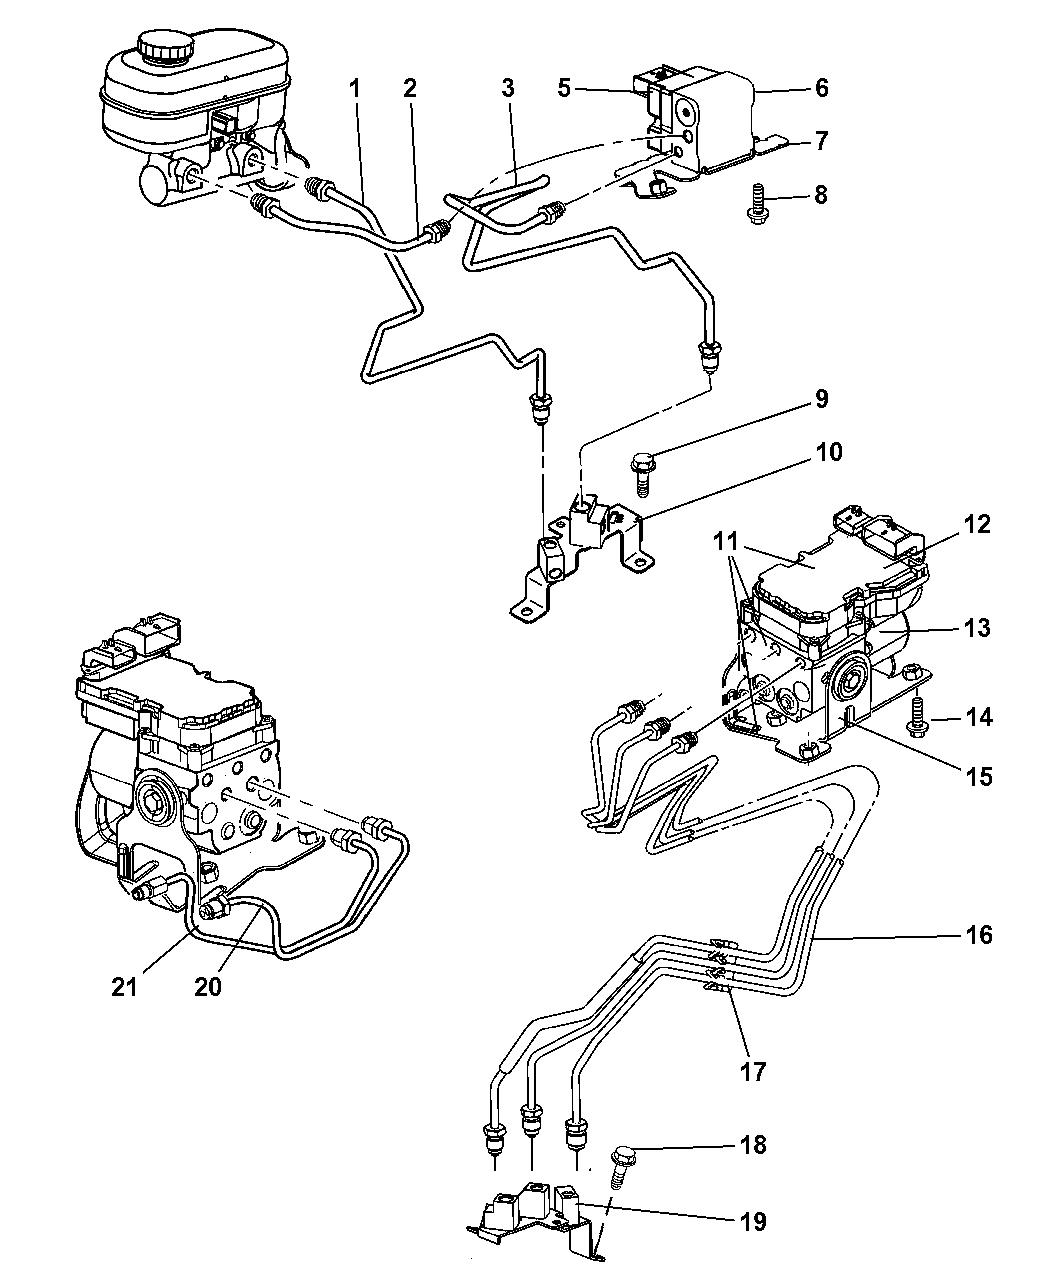 52010258ab genuine dodge line brake rh moparpartsgiant com dodge stratus brake line diagram dodge durango brake line diagram